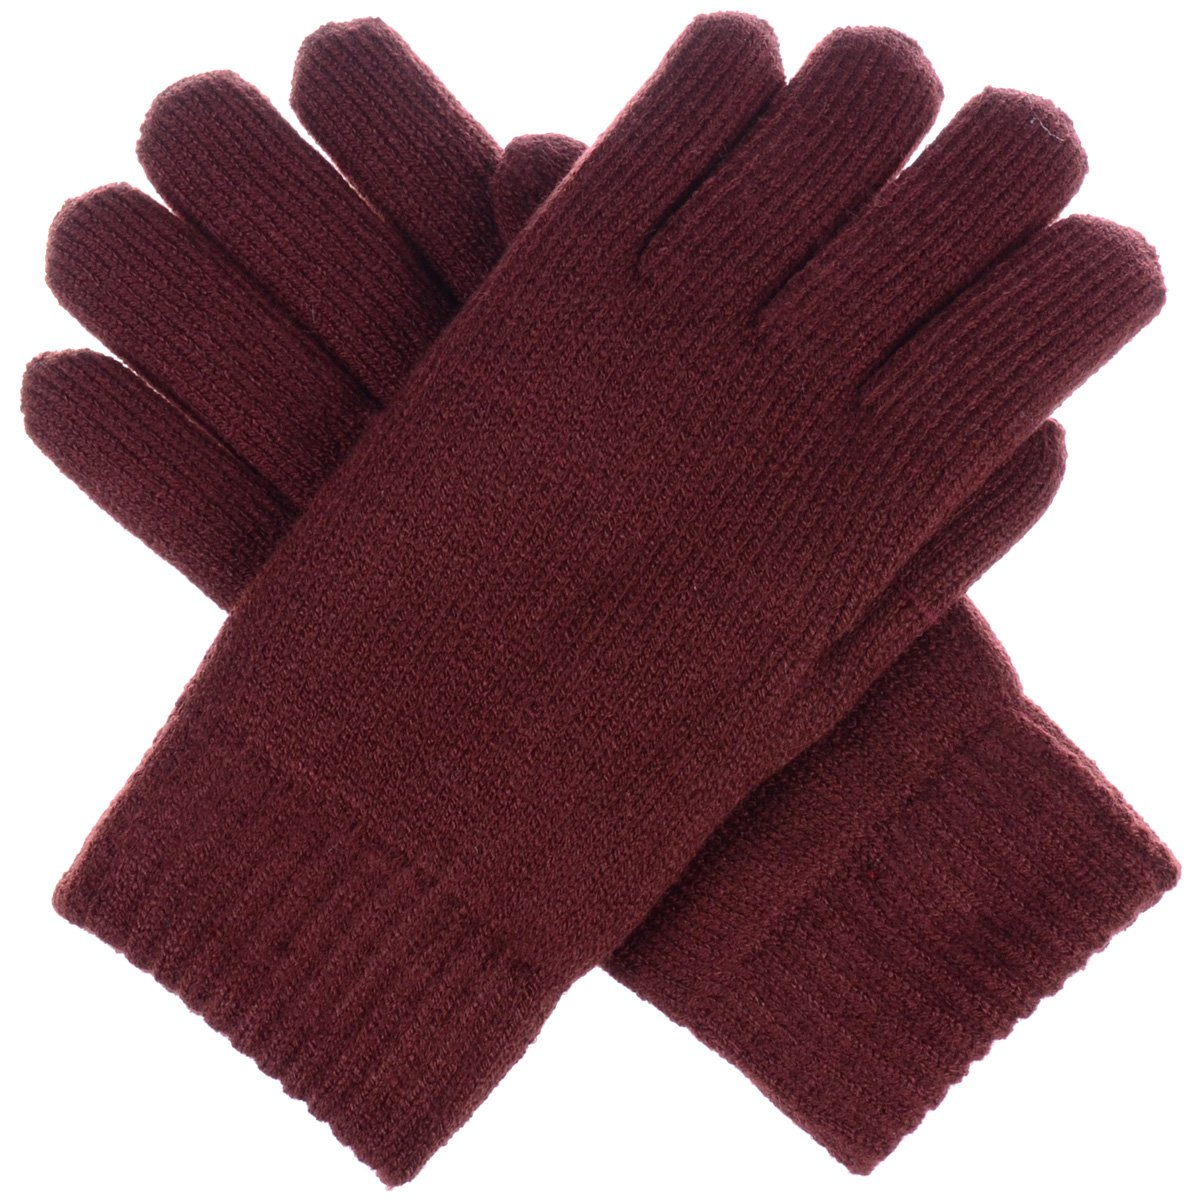 BYOS Winter Women's Toasty Warm Plush Fleece Lined Knit Gloves in Solid & Glitter 14 Solid Colors (Black) JG709-Black